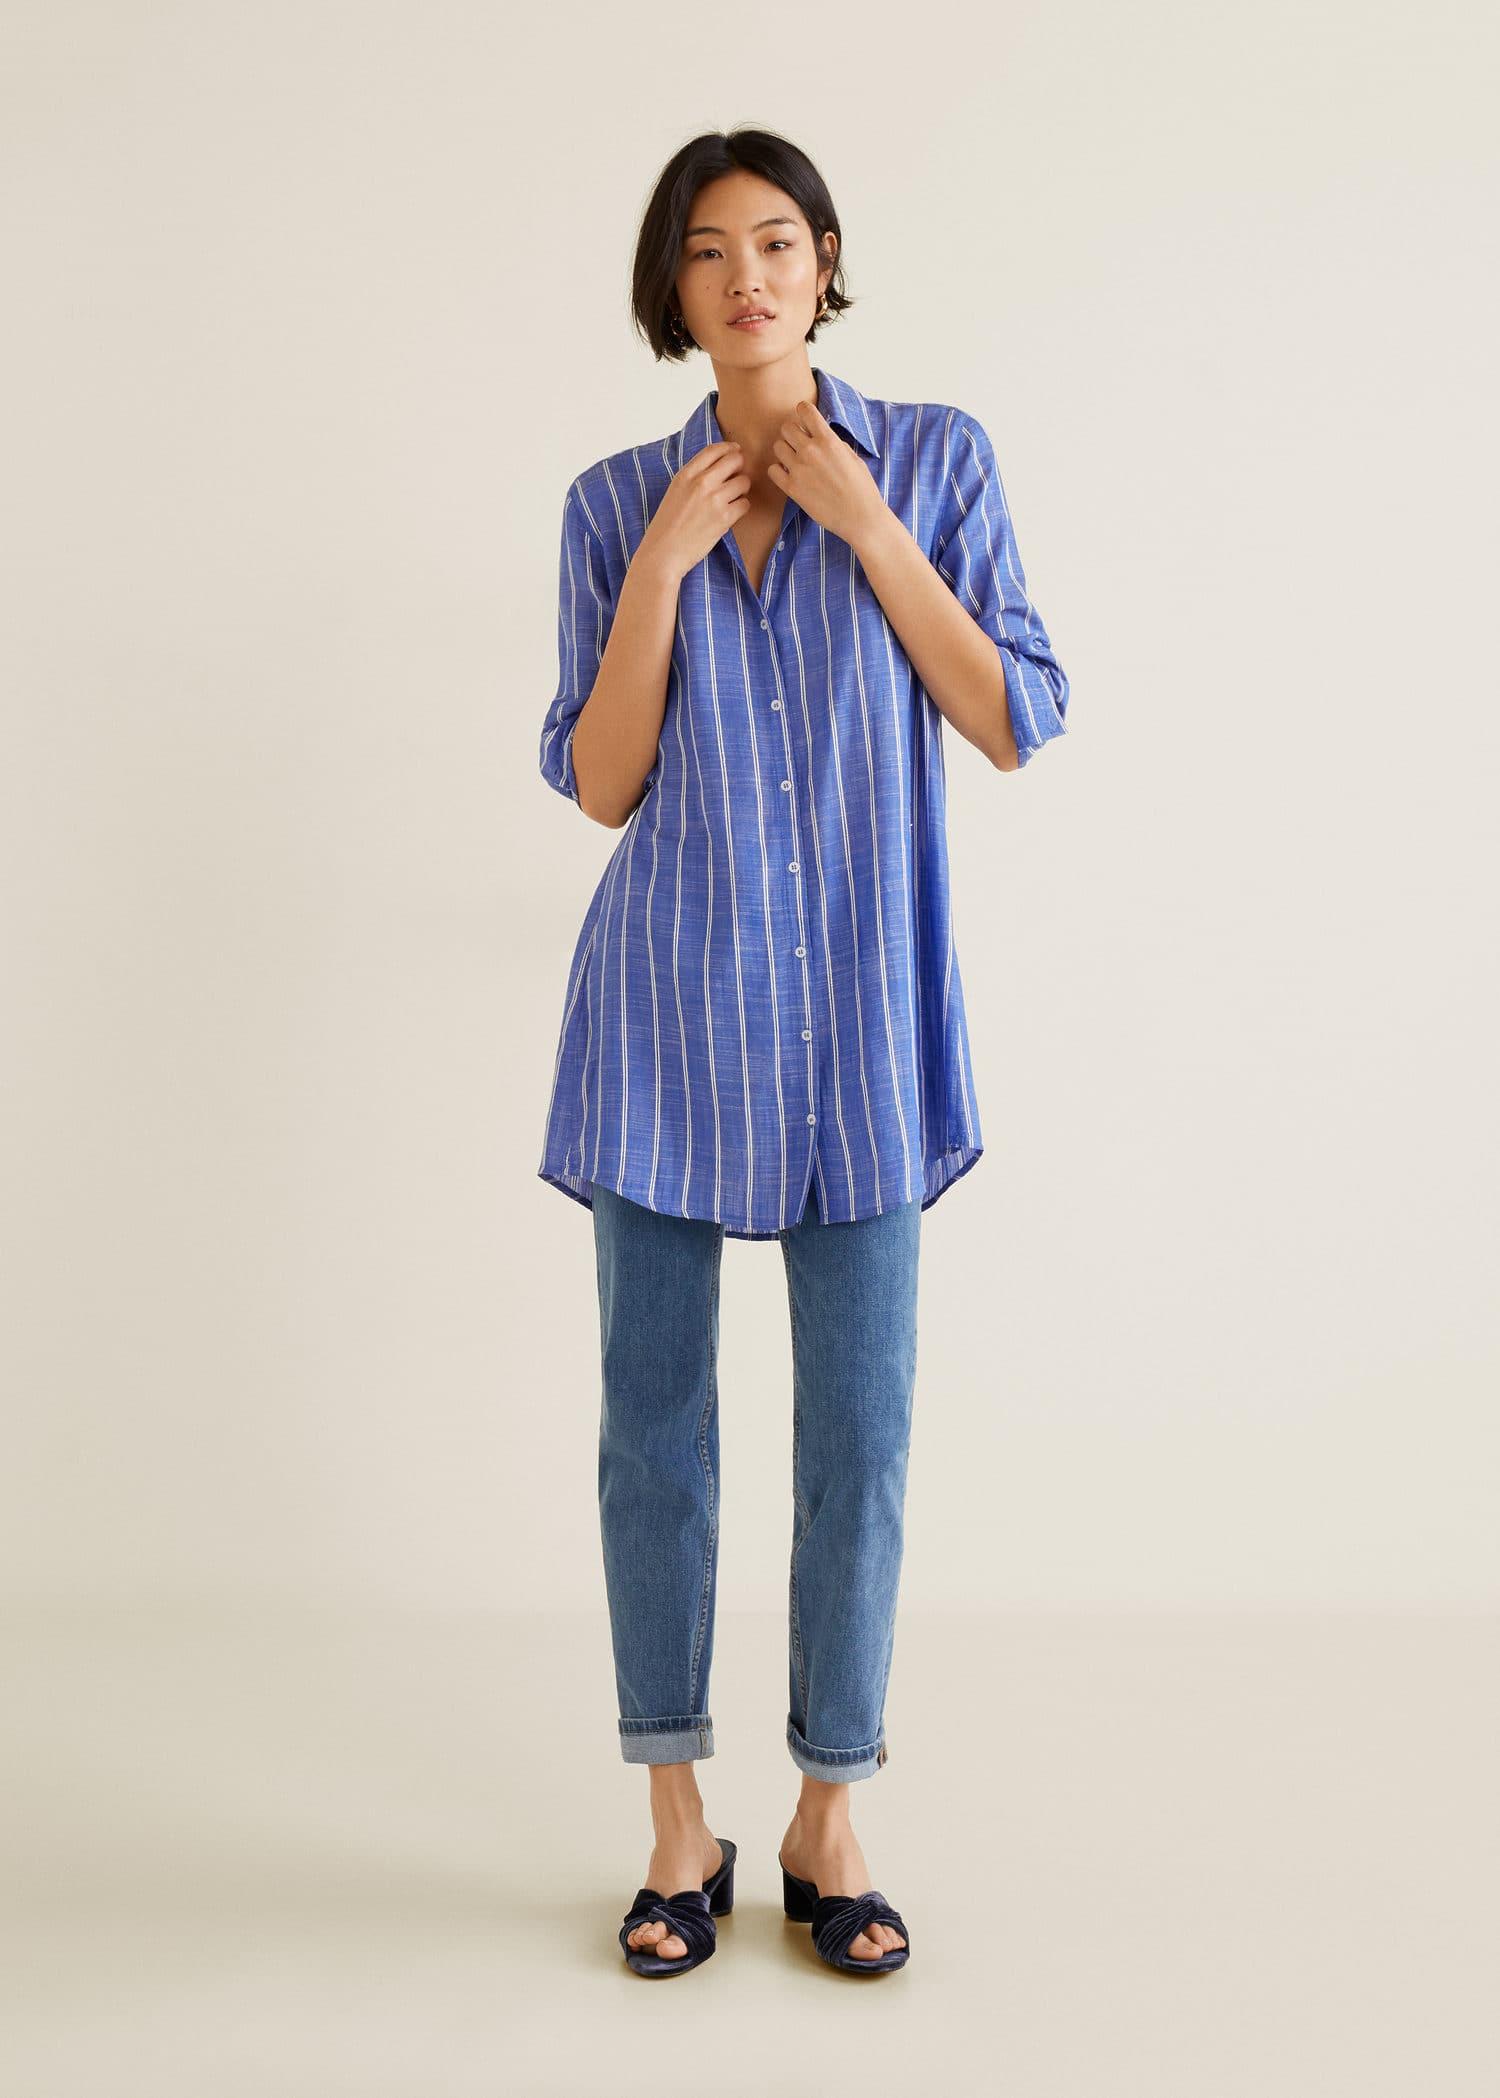 2019 Chemises Femme Mango Pour U6aqqnzx France dsrhtQ